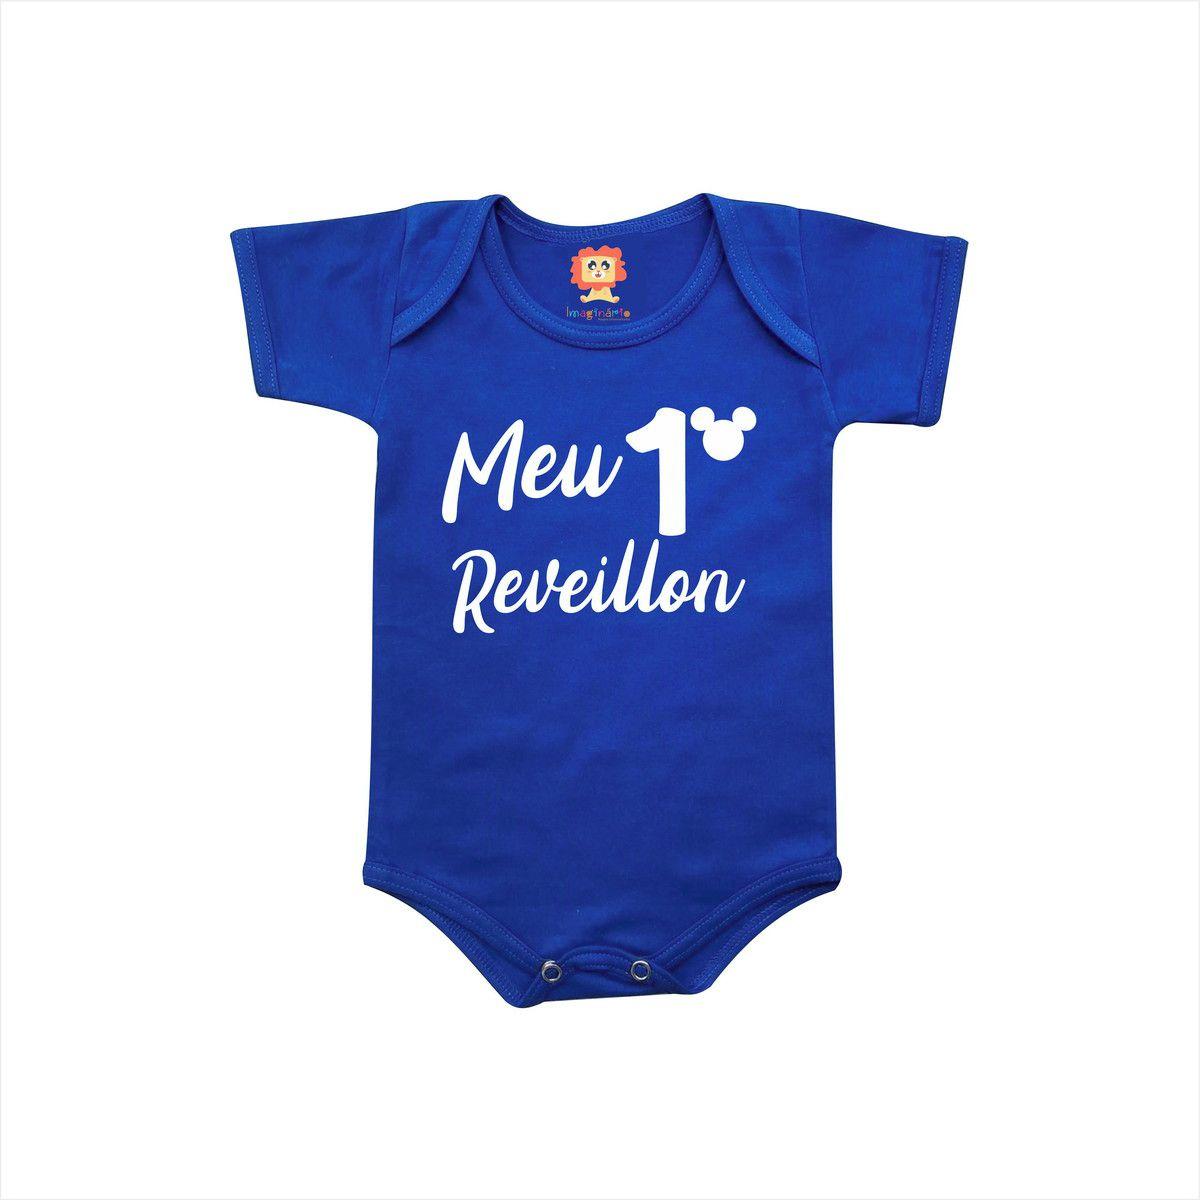 Body de Bebê ou Camiseta Meu Primeiro Reveillon